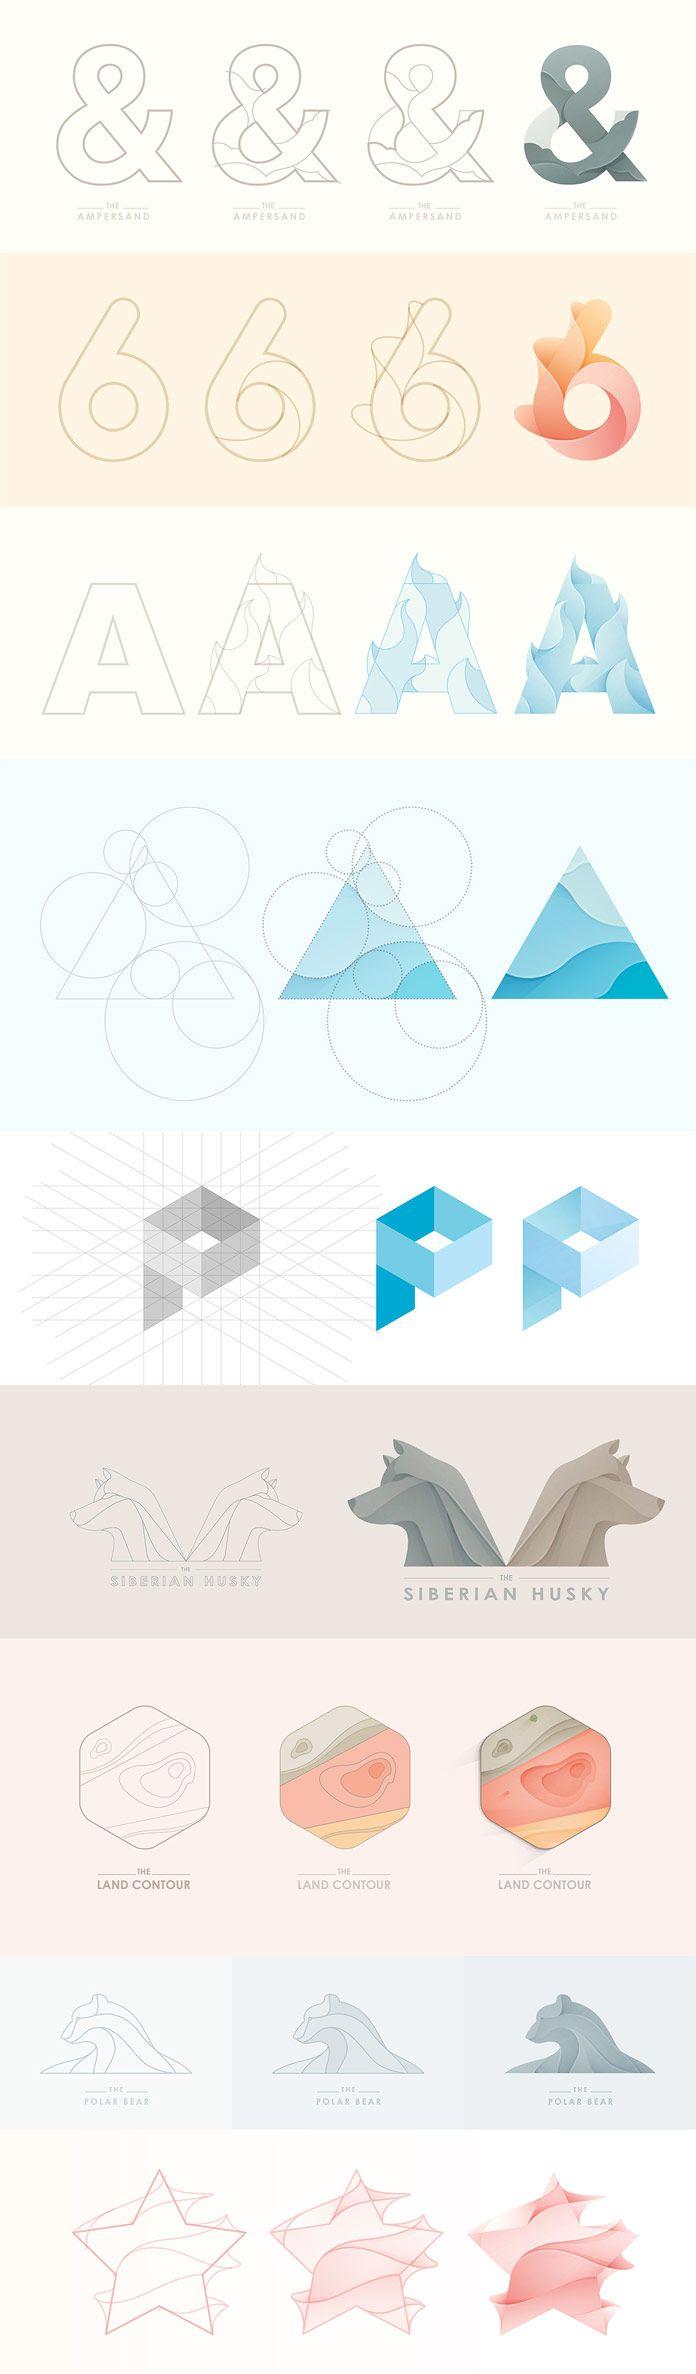 Logo designs - process case studies by Yoga Perdana.